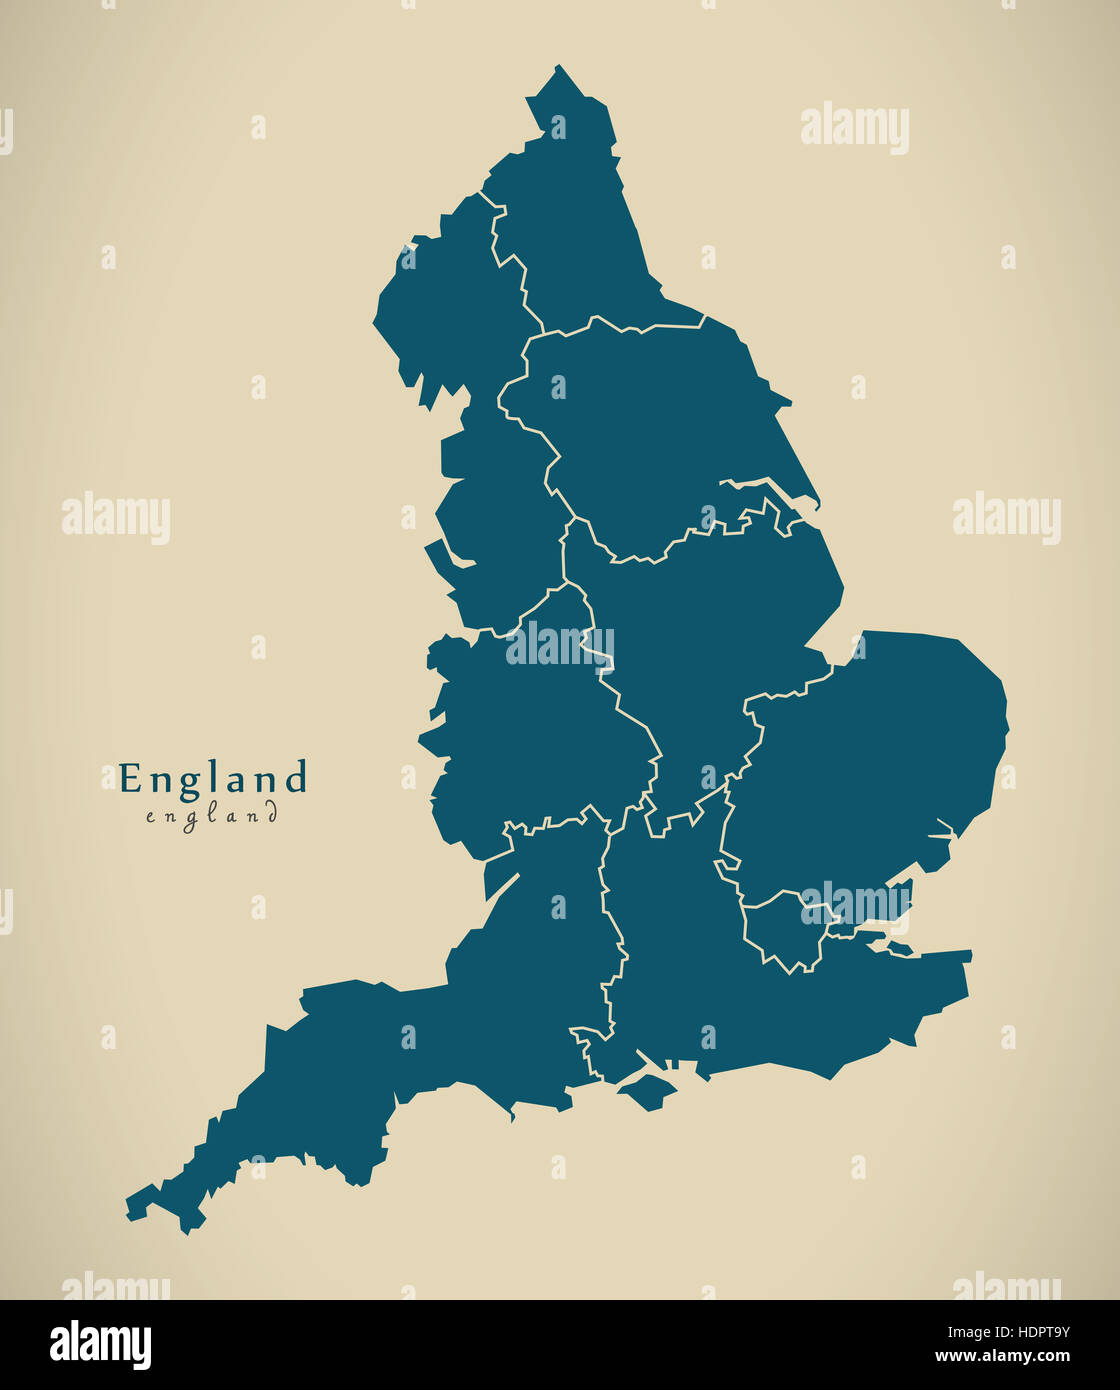 Modern Map - England with counties UK Illustration Stock ... on australia illustration, london illustration, singapore illustration, tv illustration, chile illustration, italy illustration, thailand illustration, africa illustration, china illustration, dj illustration,